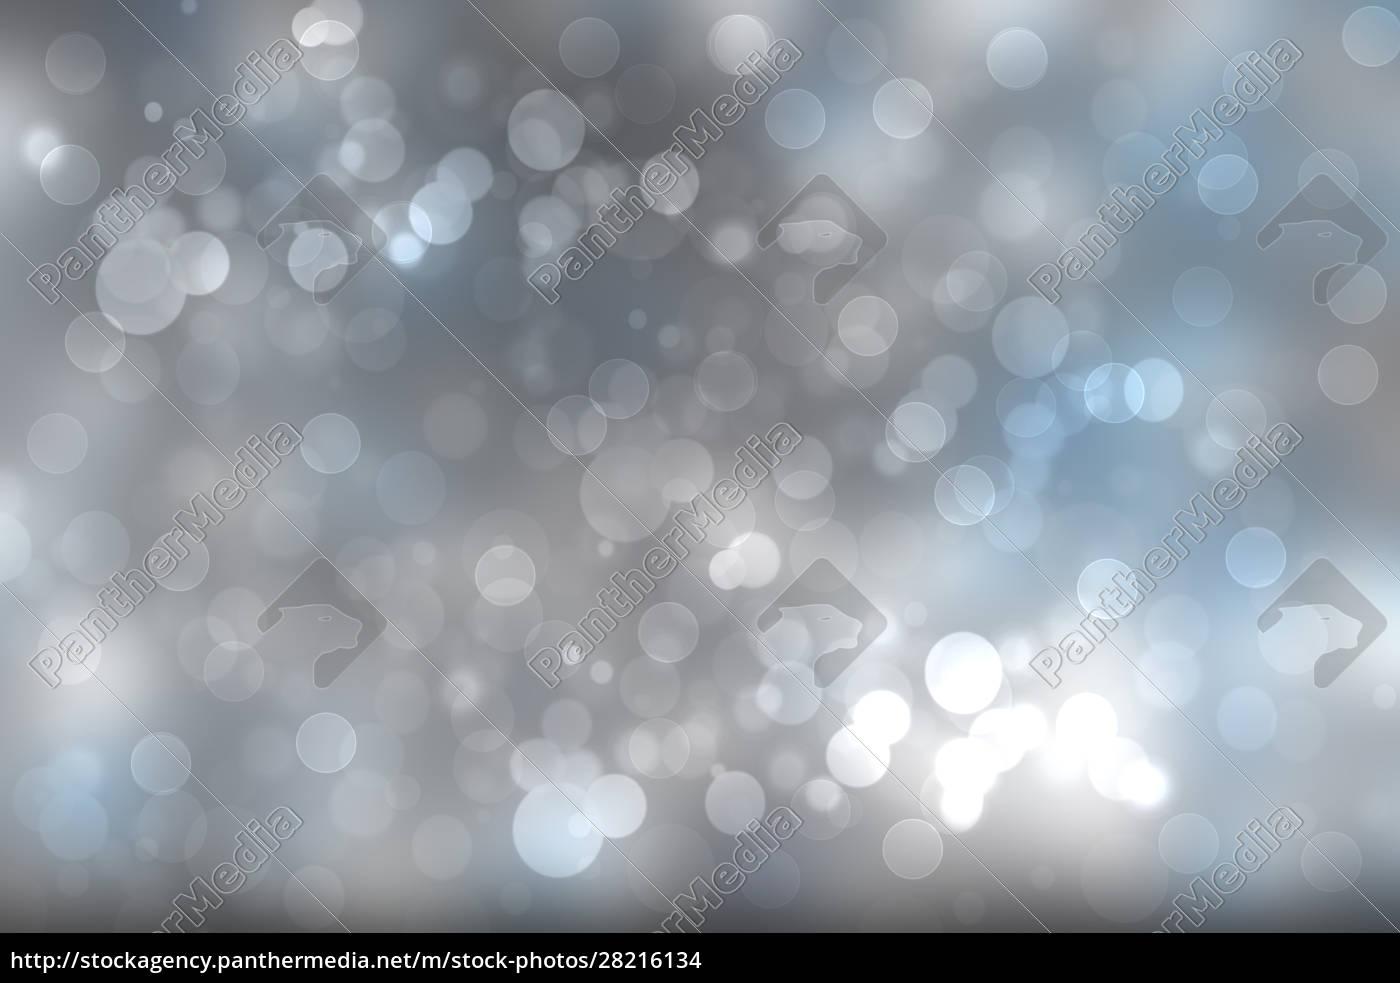 abstract, festive, gradient, light, blue, gray - 28216134